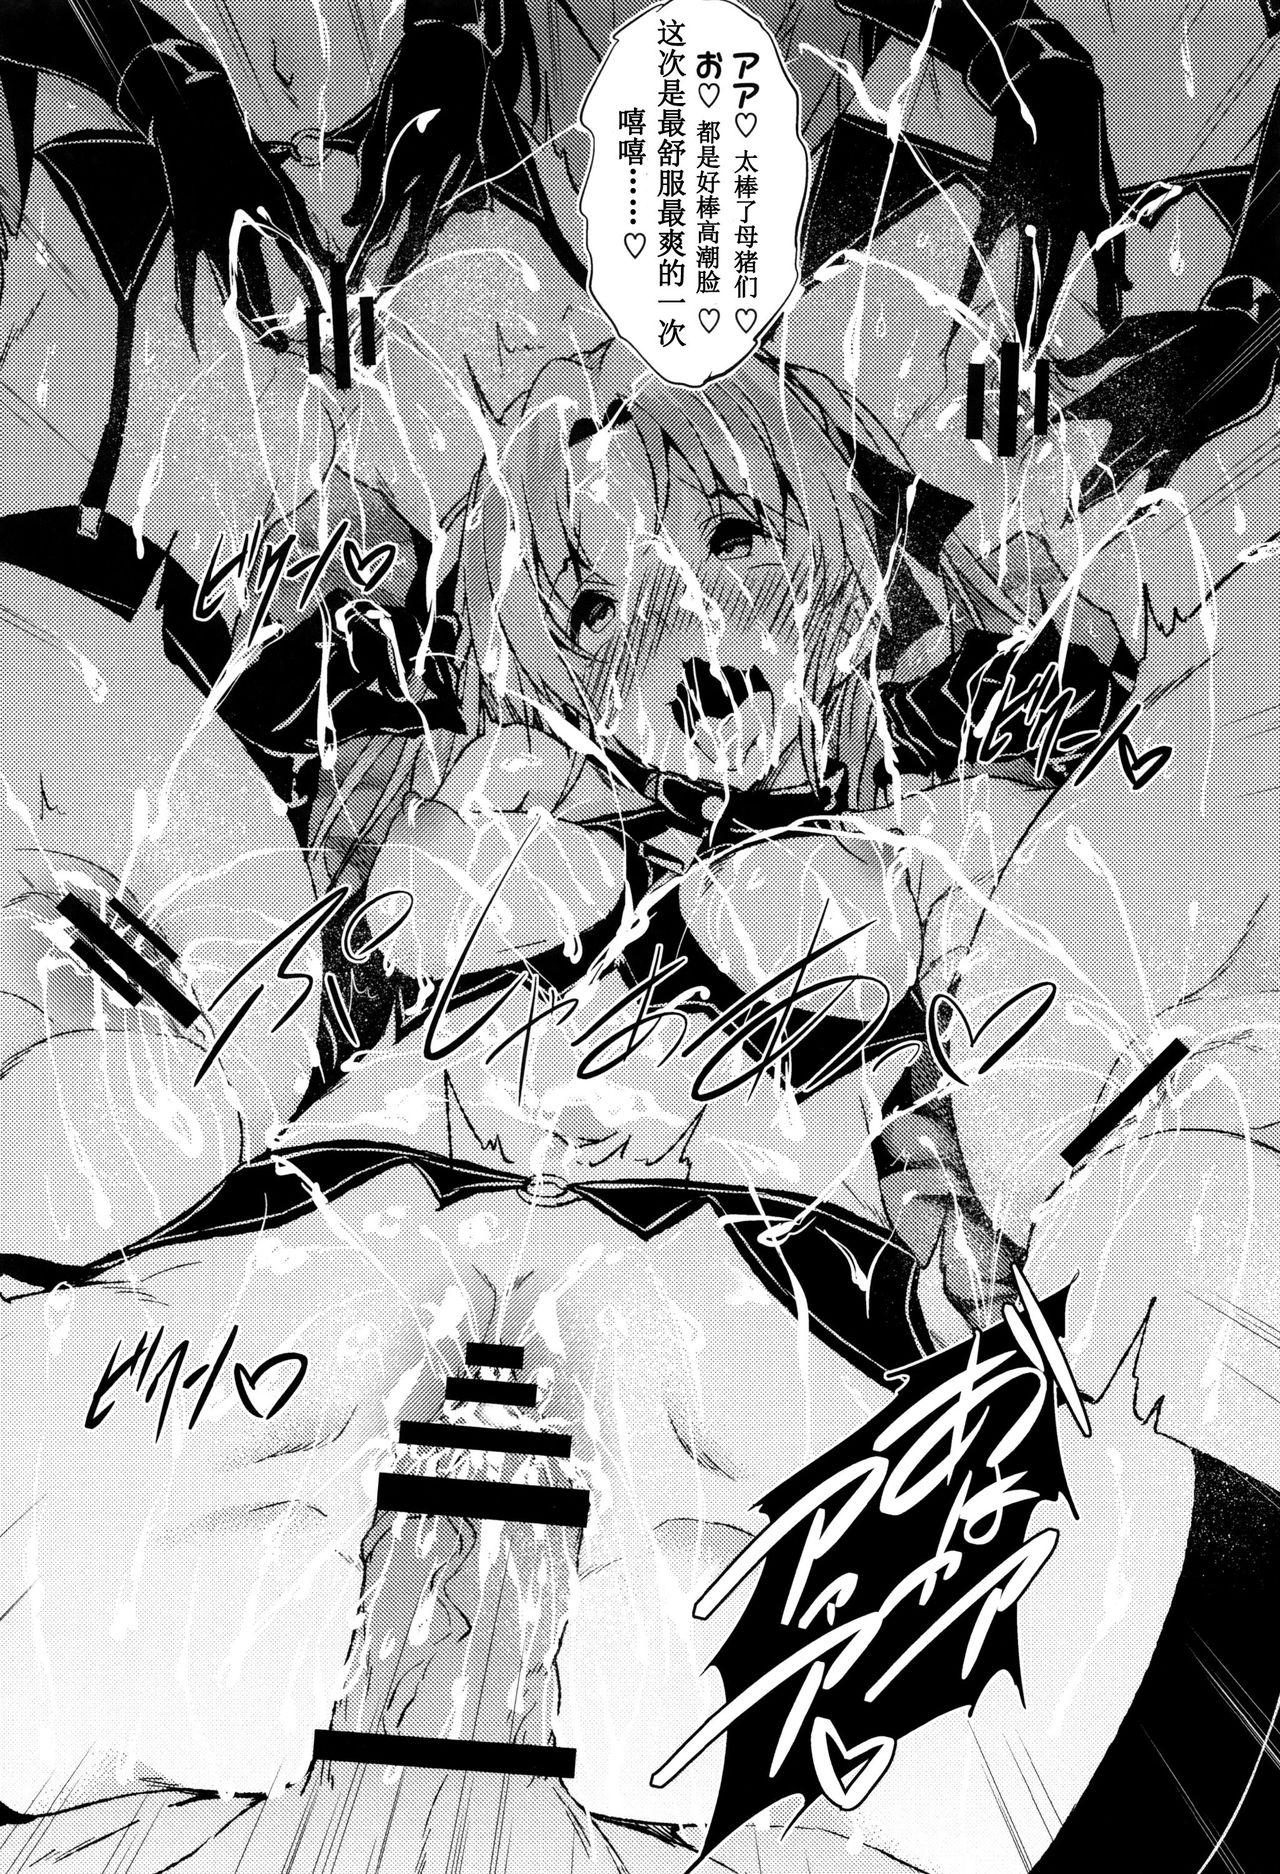 [Fukuyama Naoto] Saint Yurigaoka Jogakuen Seido-kai Saishuuwa | Saint Yurigaoka Jogakuen Seido-kai Conclusion (COMIC Megastore Alpha 2017-05) [Chinese] [水水的几把红意译汉化] [Digital] 15